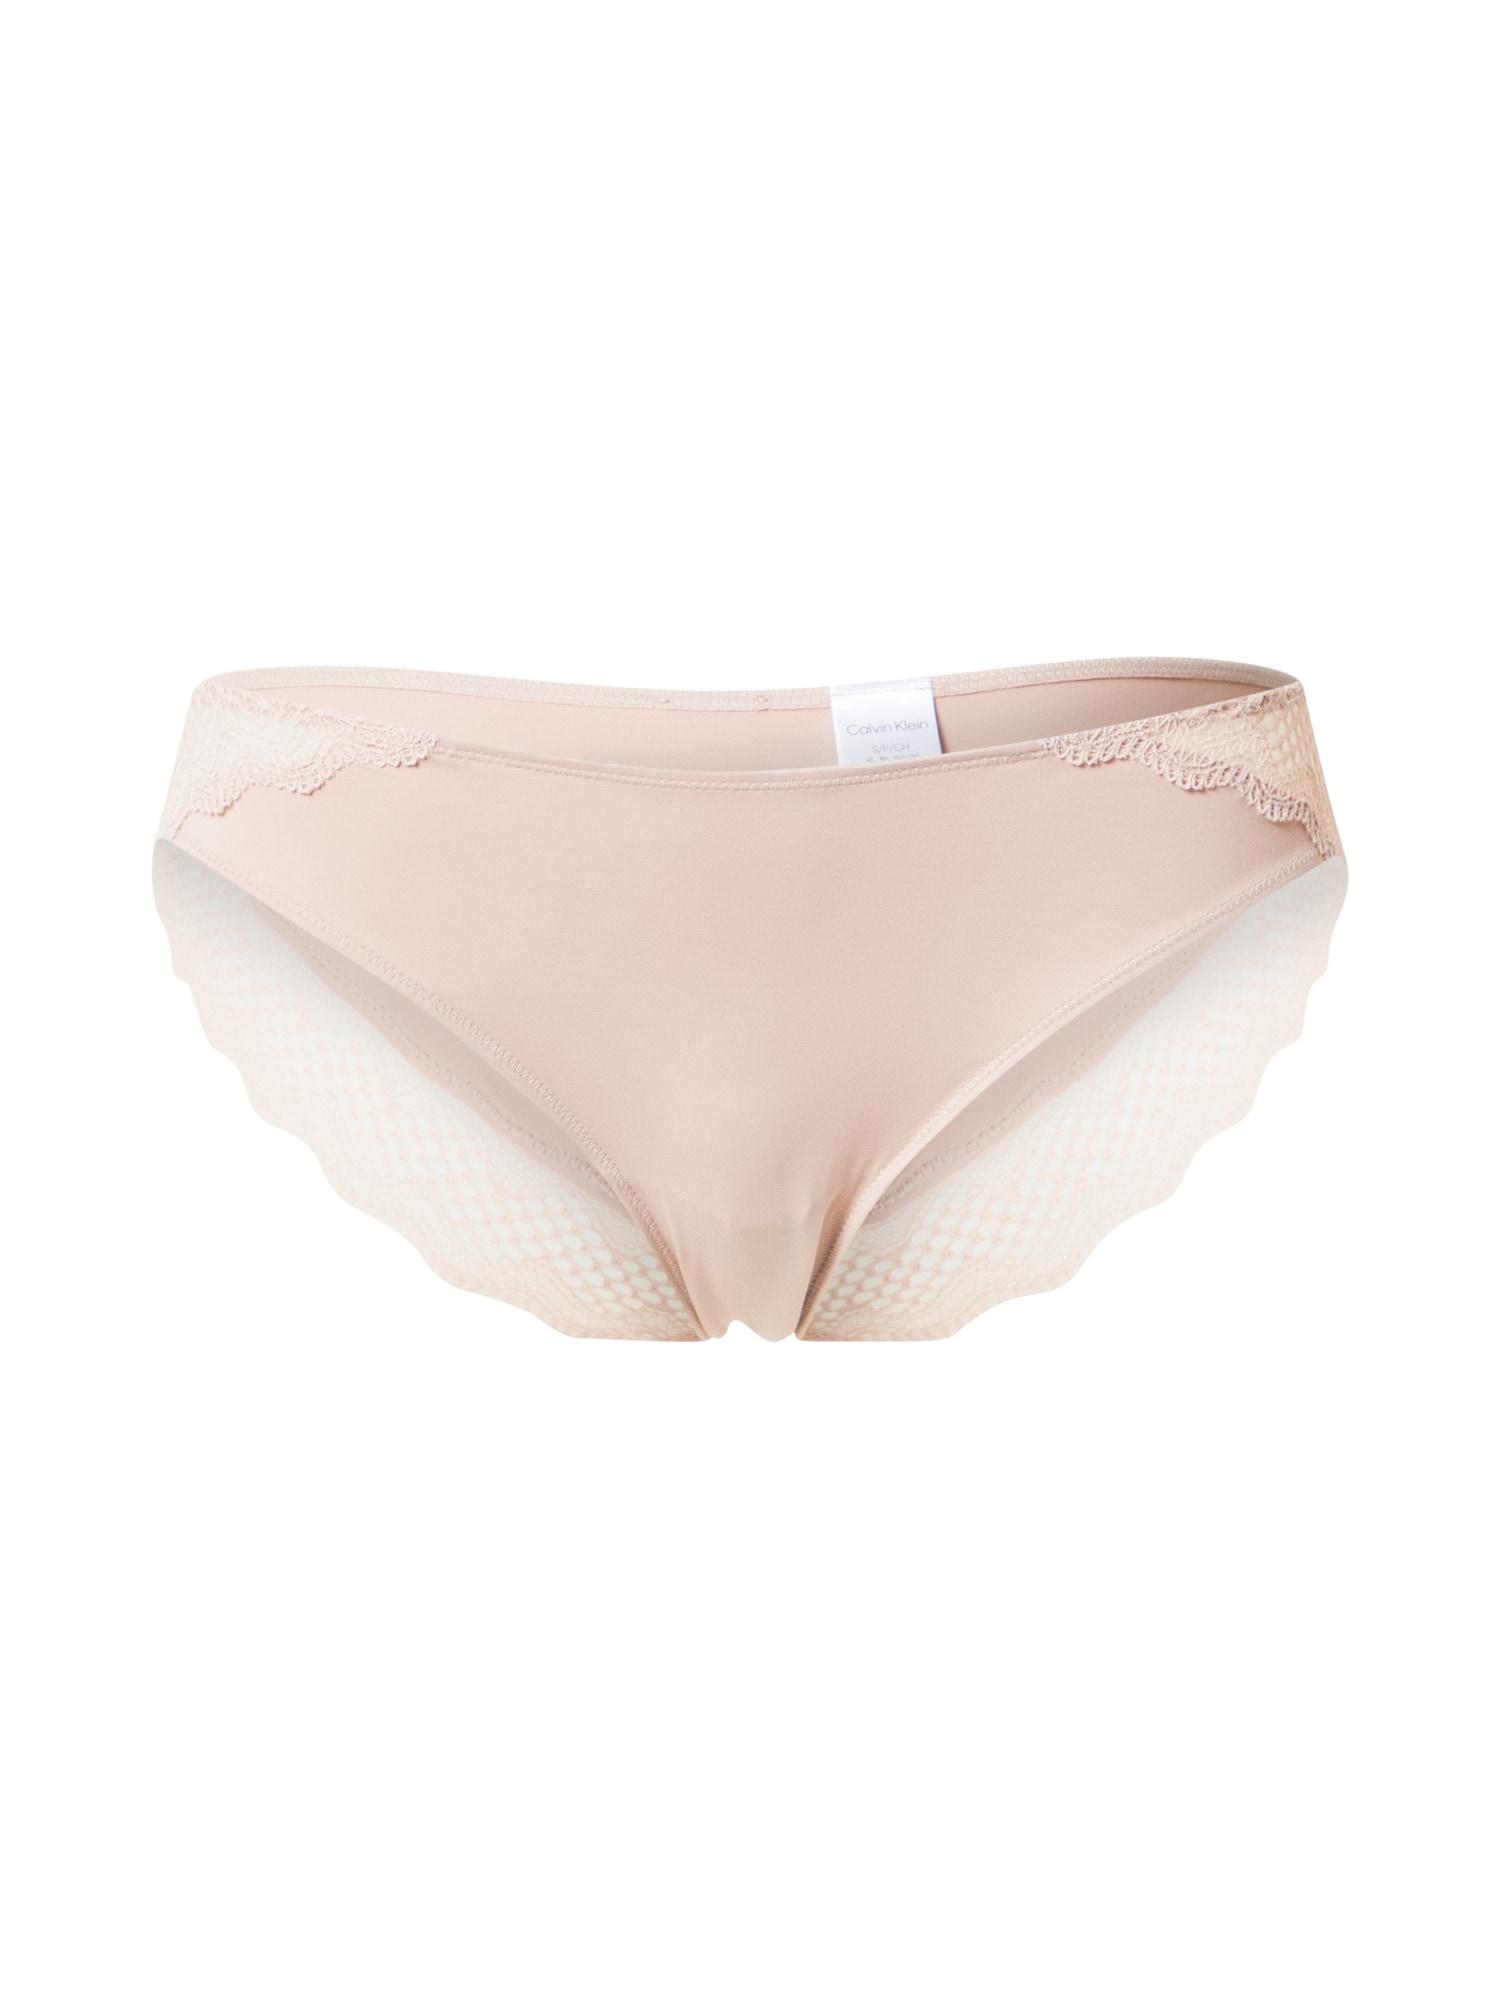 Calvin Klein Underwear Moteriškos kelnaitės pudros spalva